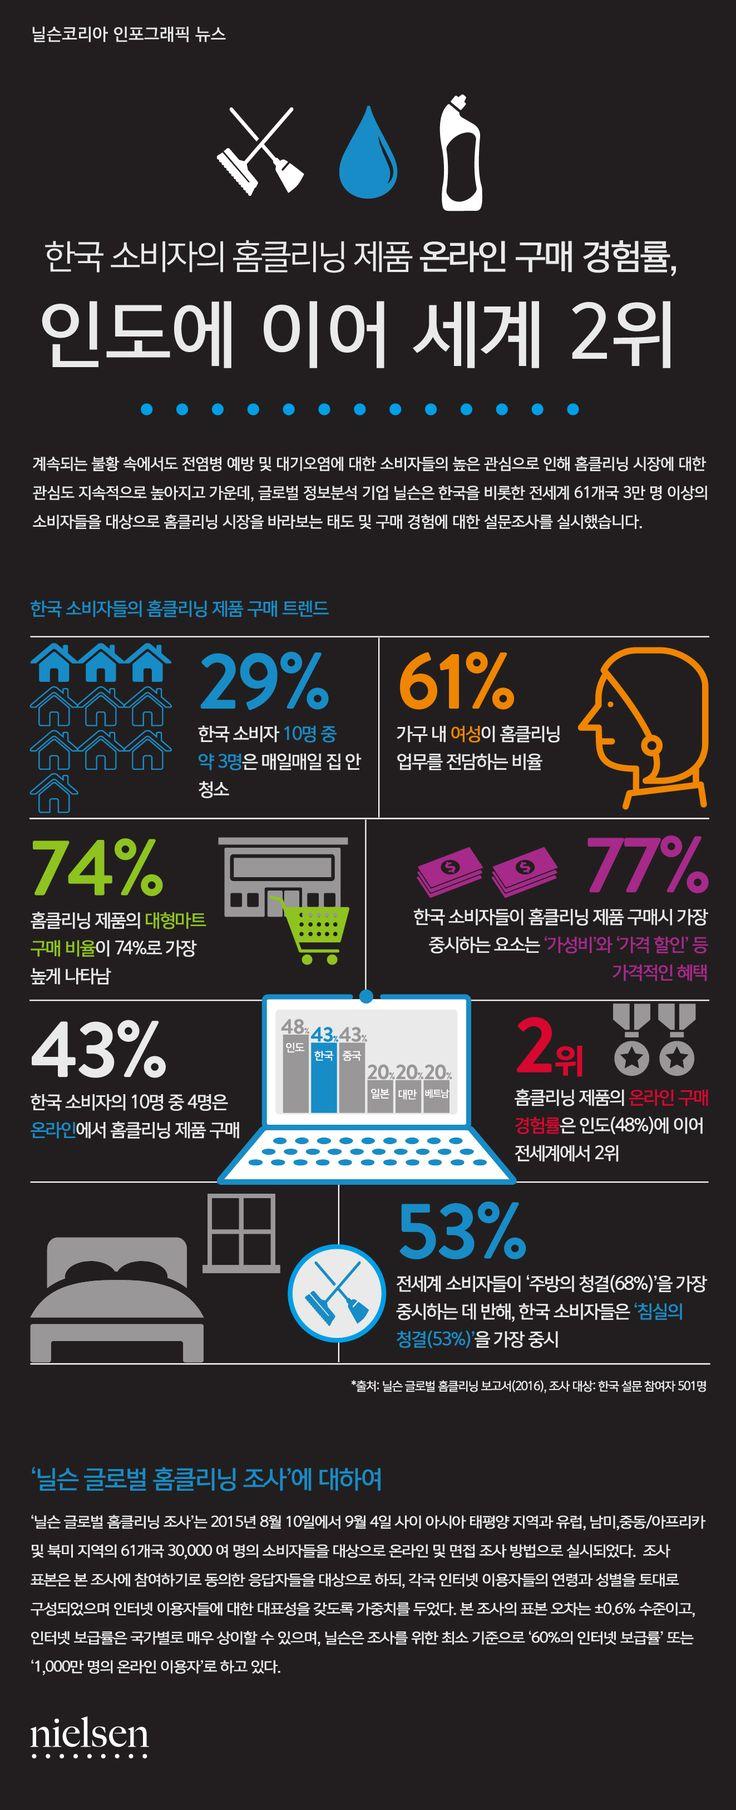 Nielsen Global Home Care Report - 한국 소비자 홈클리닝 제품 온라인 구매 경험률, 인도에 이어 세계 2위  #infographic #homecare #인포그래픽 #닐슨코리아 #홈클리닝 #홈케어 #소비재트렌드